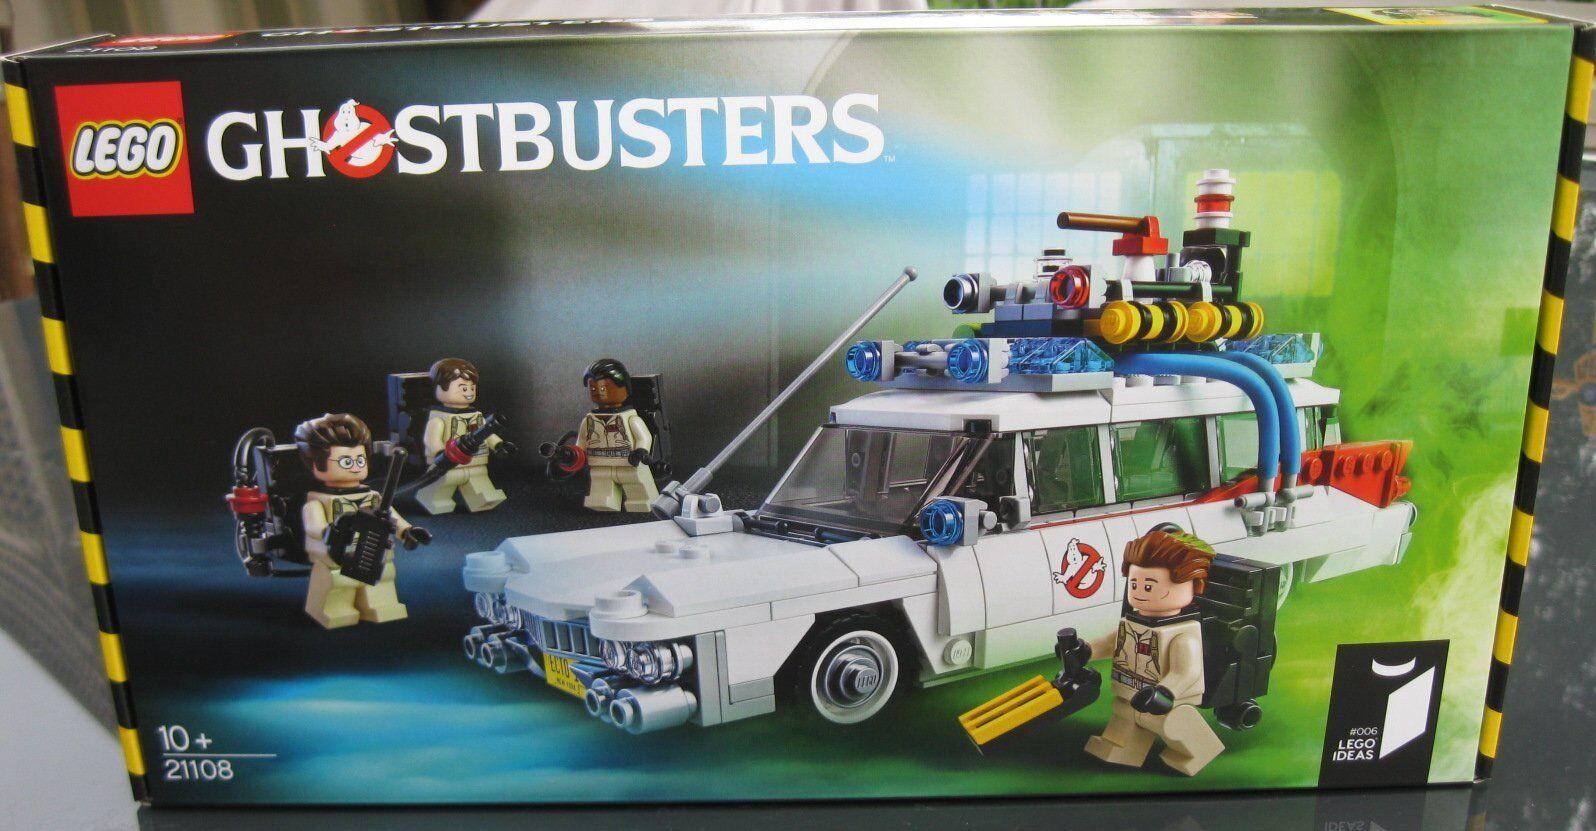 LEGO Bausatz 21108 - Ghostbusters Car ECTO-1 - NEU OVP